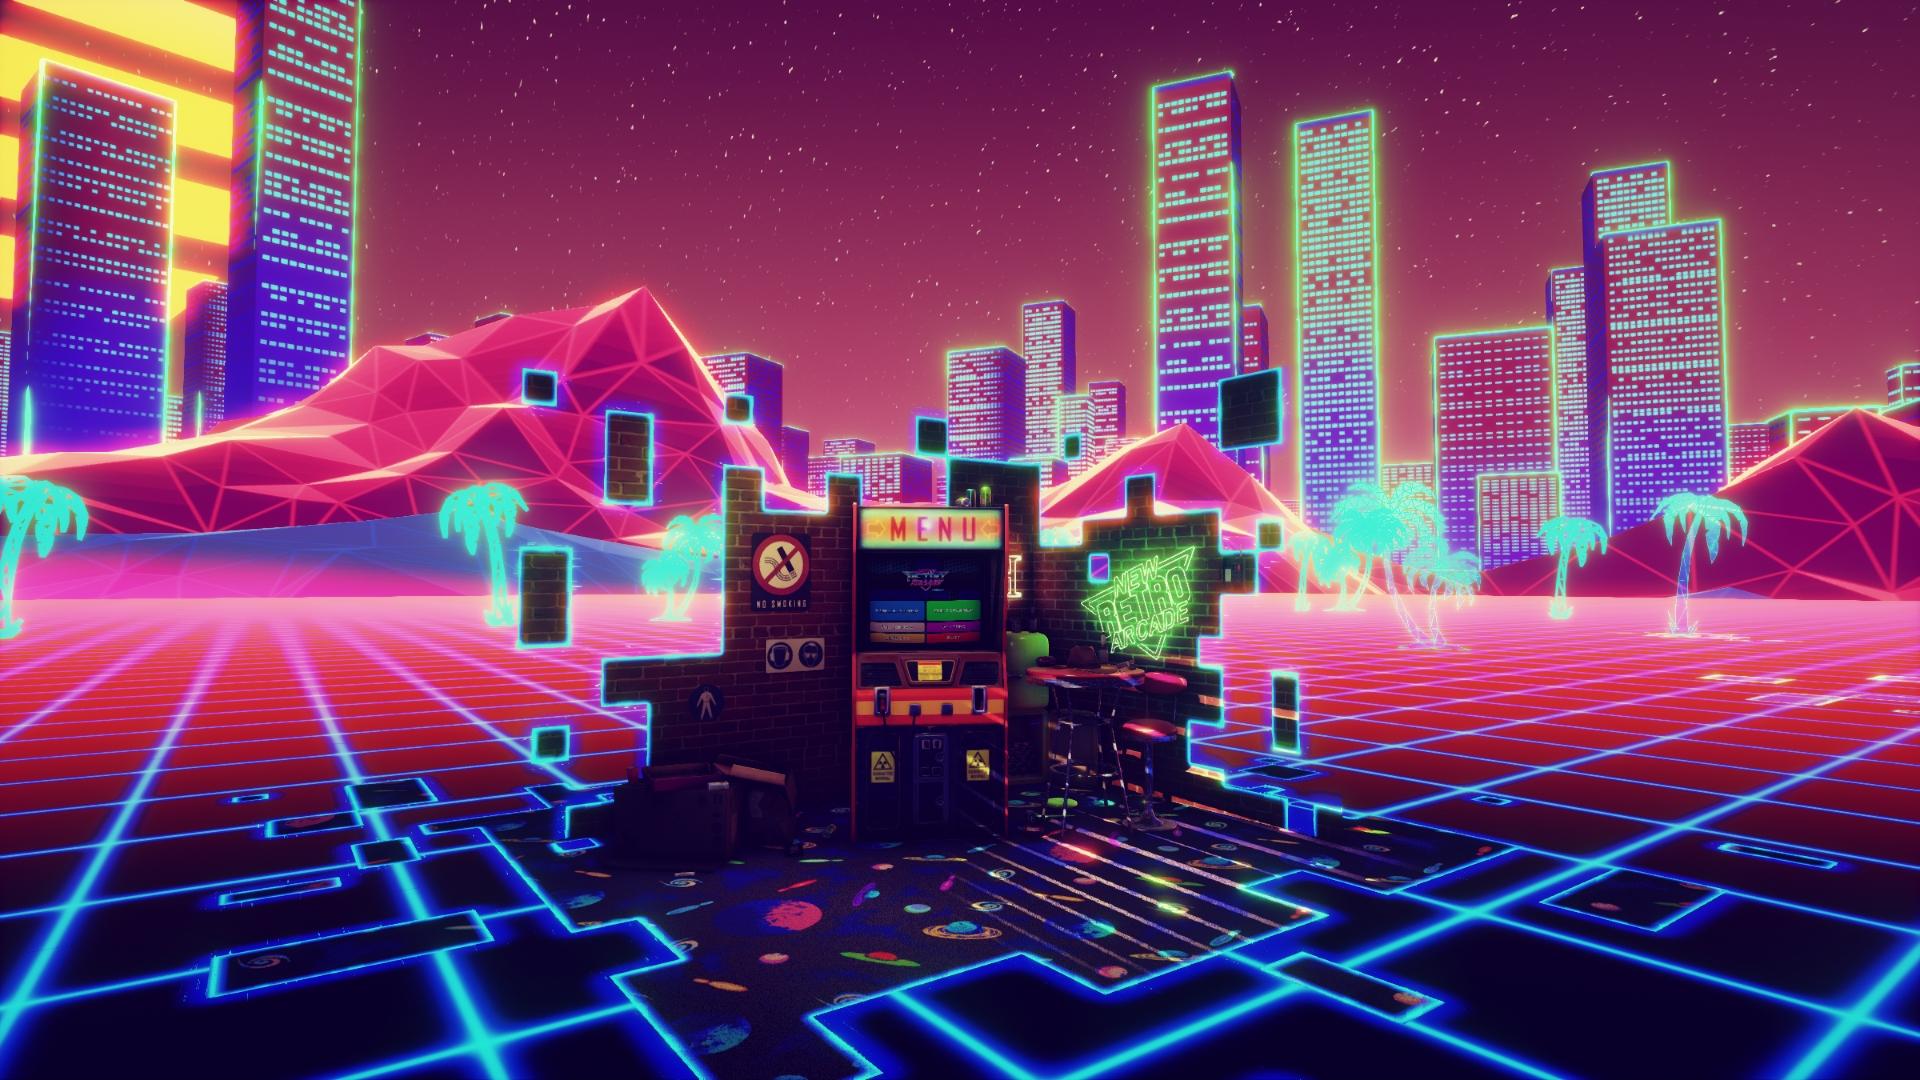 New Retro Arcade Neon 4